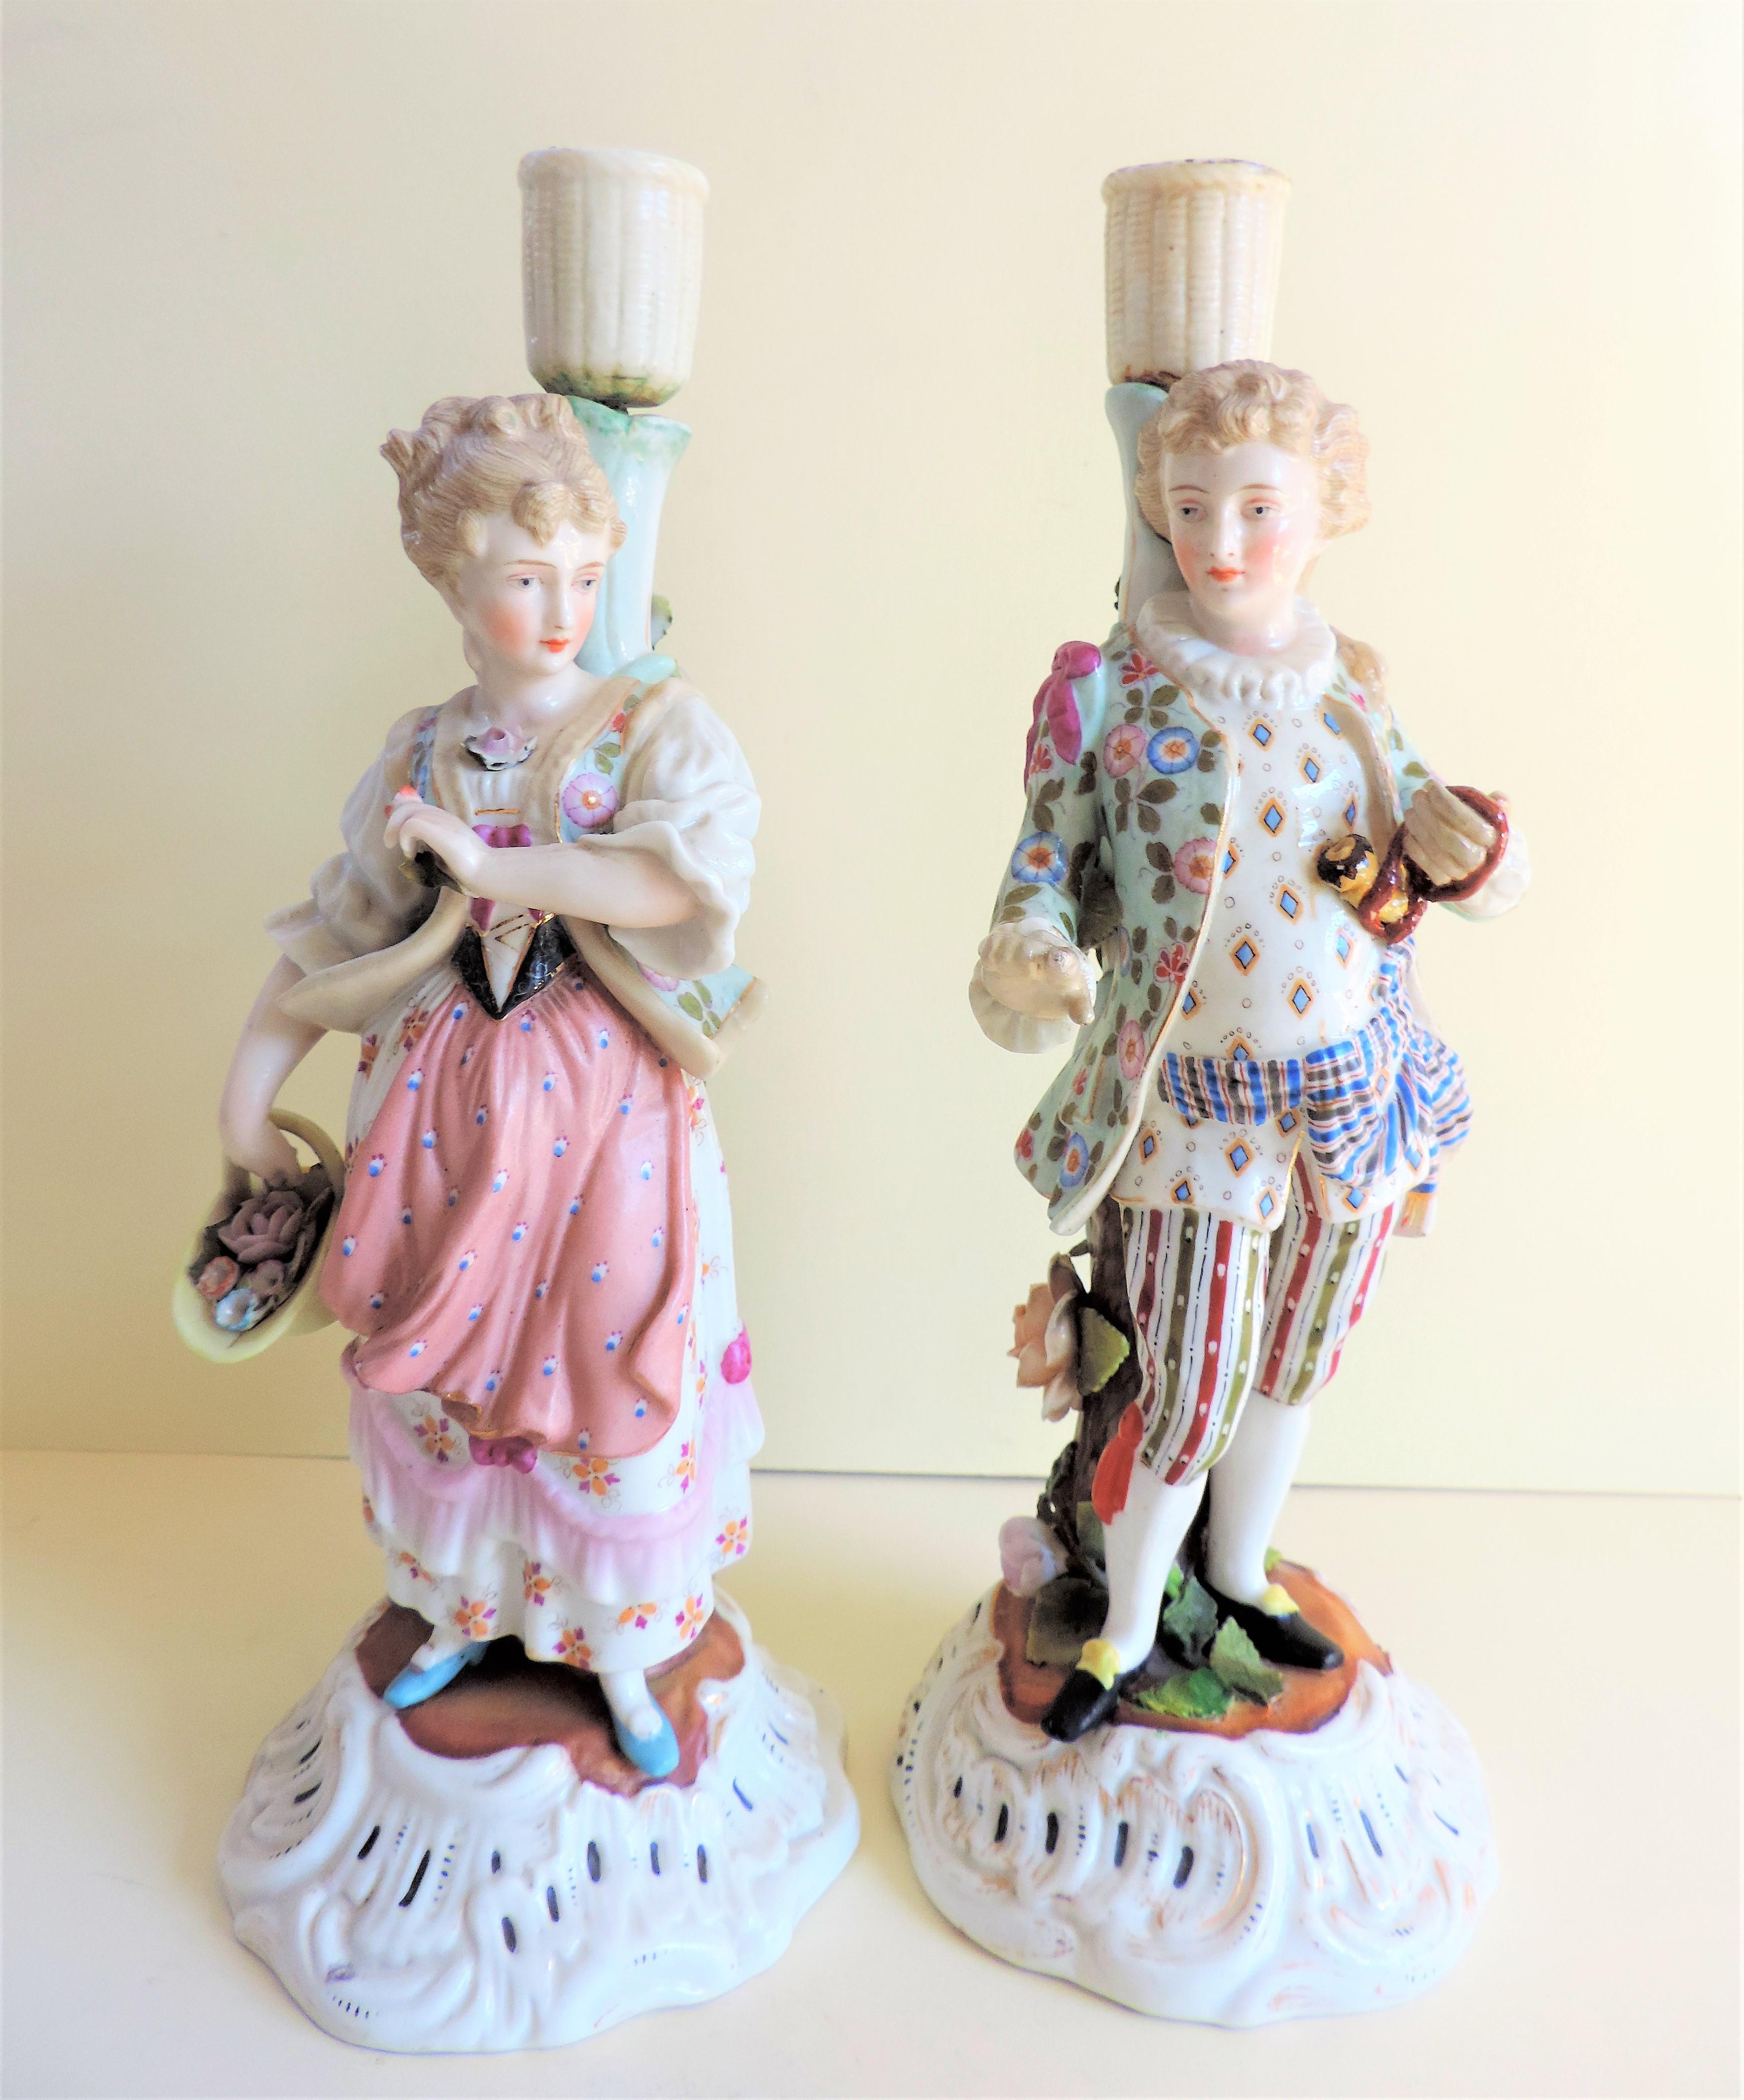 Pair Antique Sitzendorf Porcelain Candlesticks circa 1810